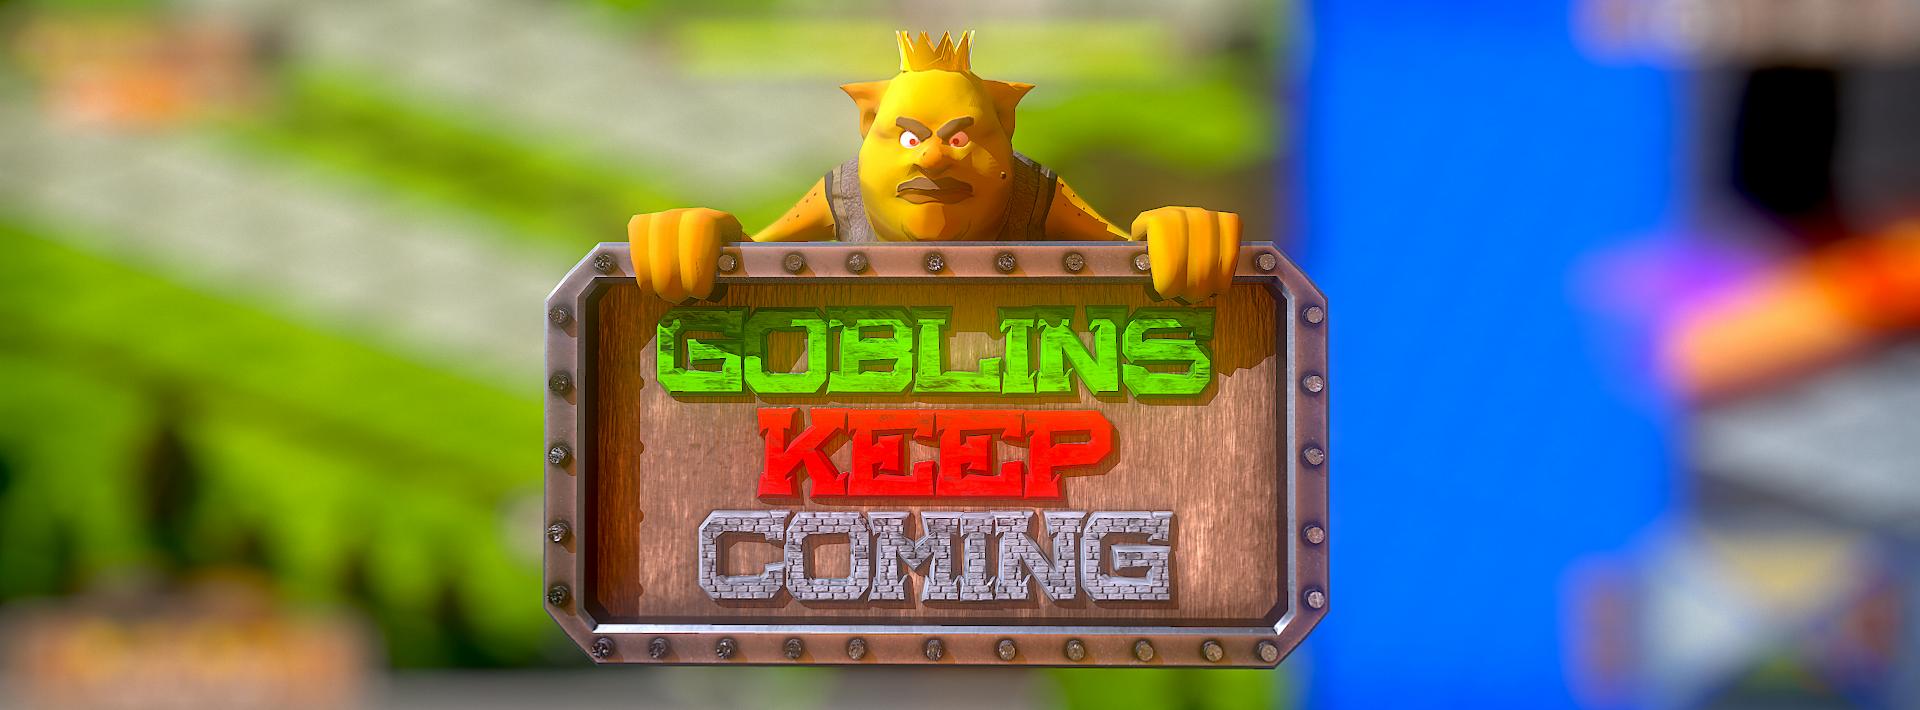 Goblins Keep Coming